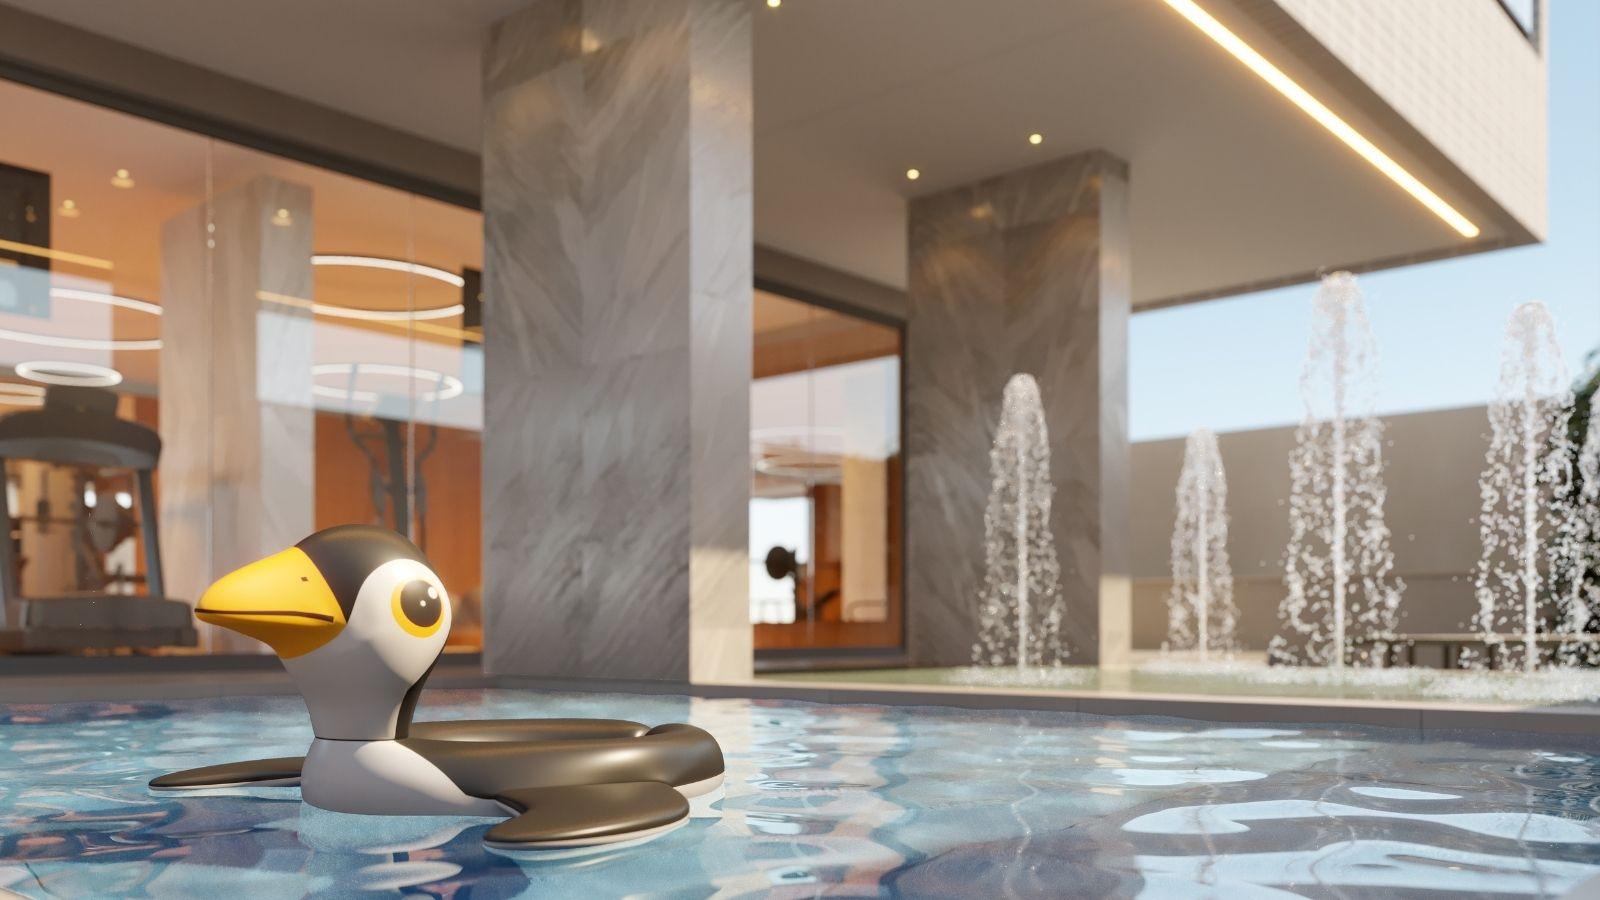 Perspectiva ilustrada da Área da piscina